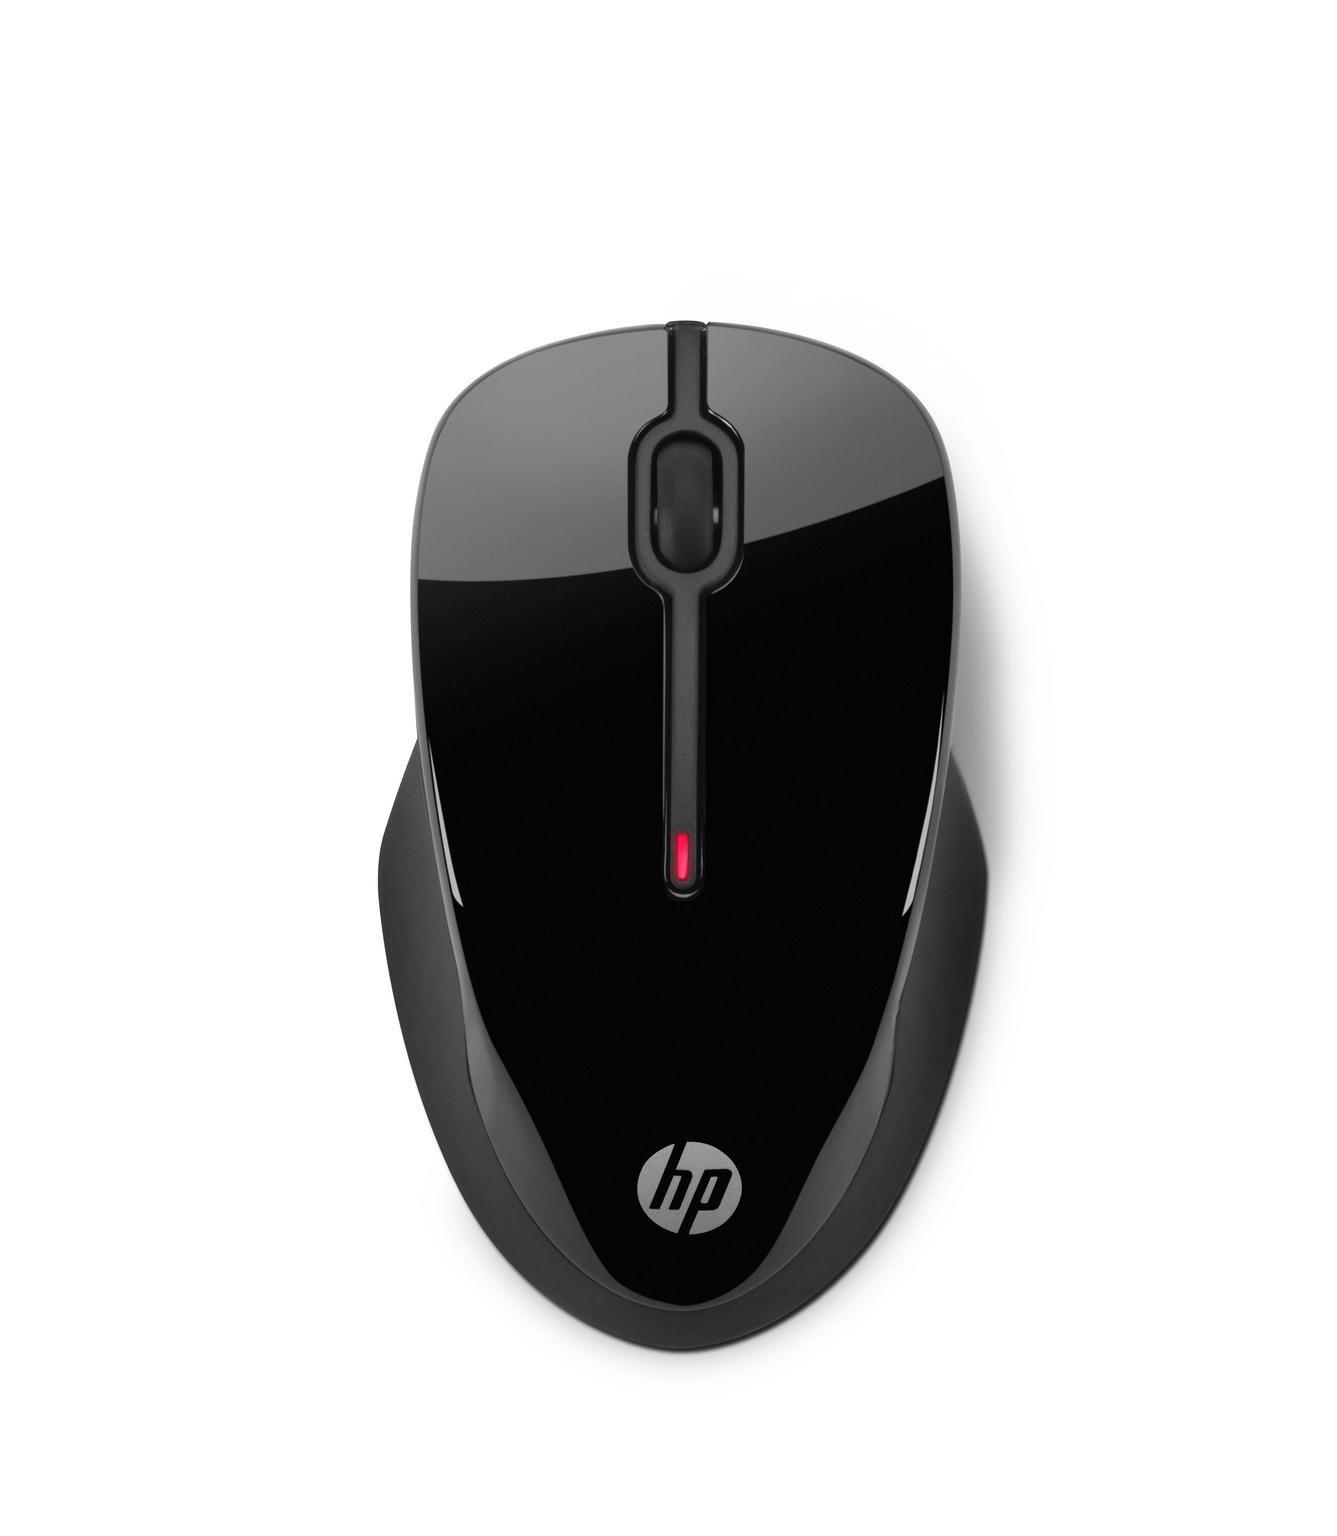 HP X3500 zwart